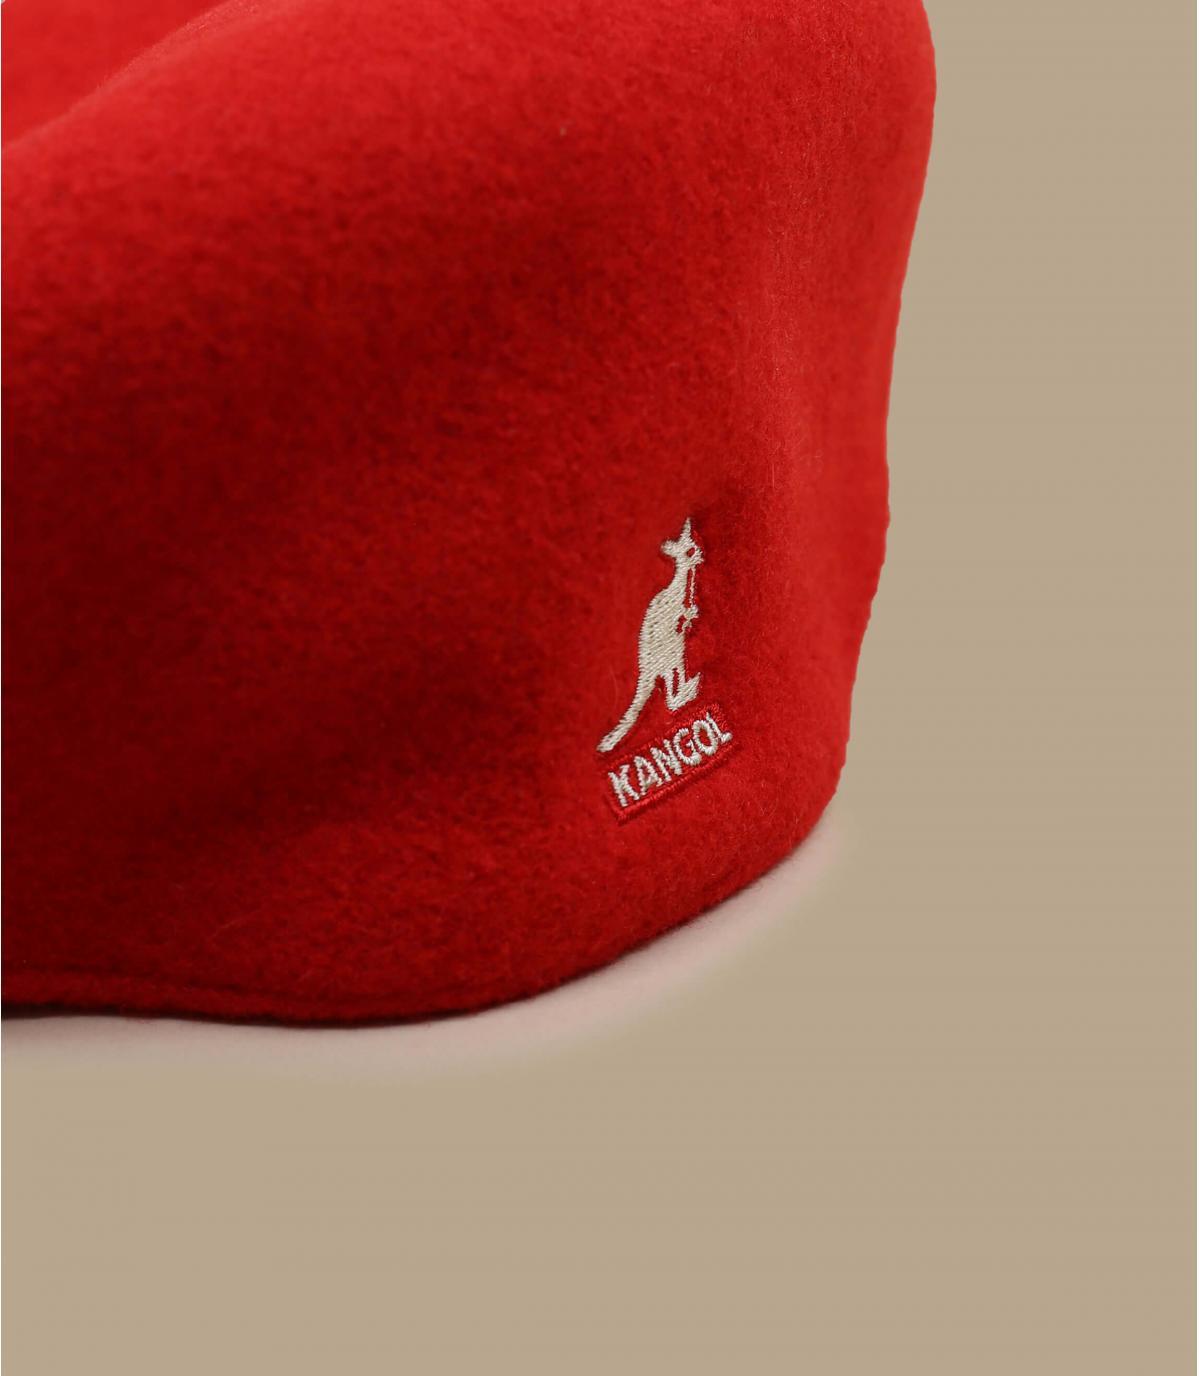 Detalles 504 wool rojo imagen 2